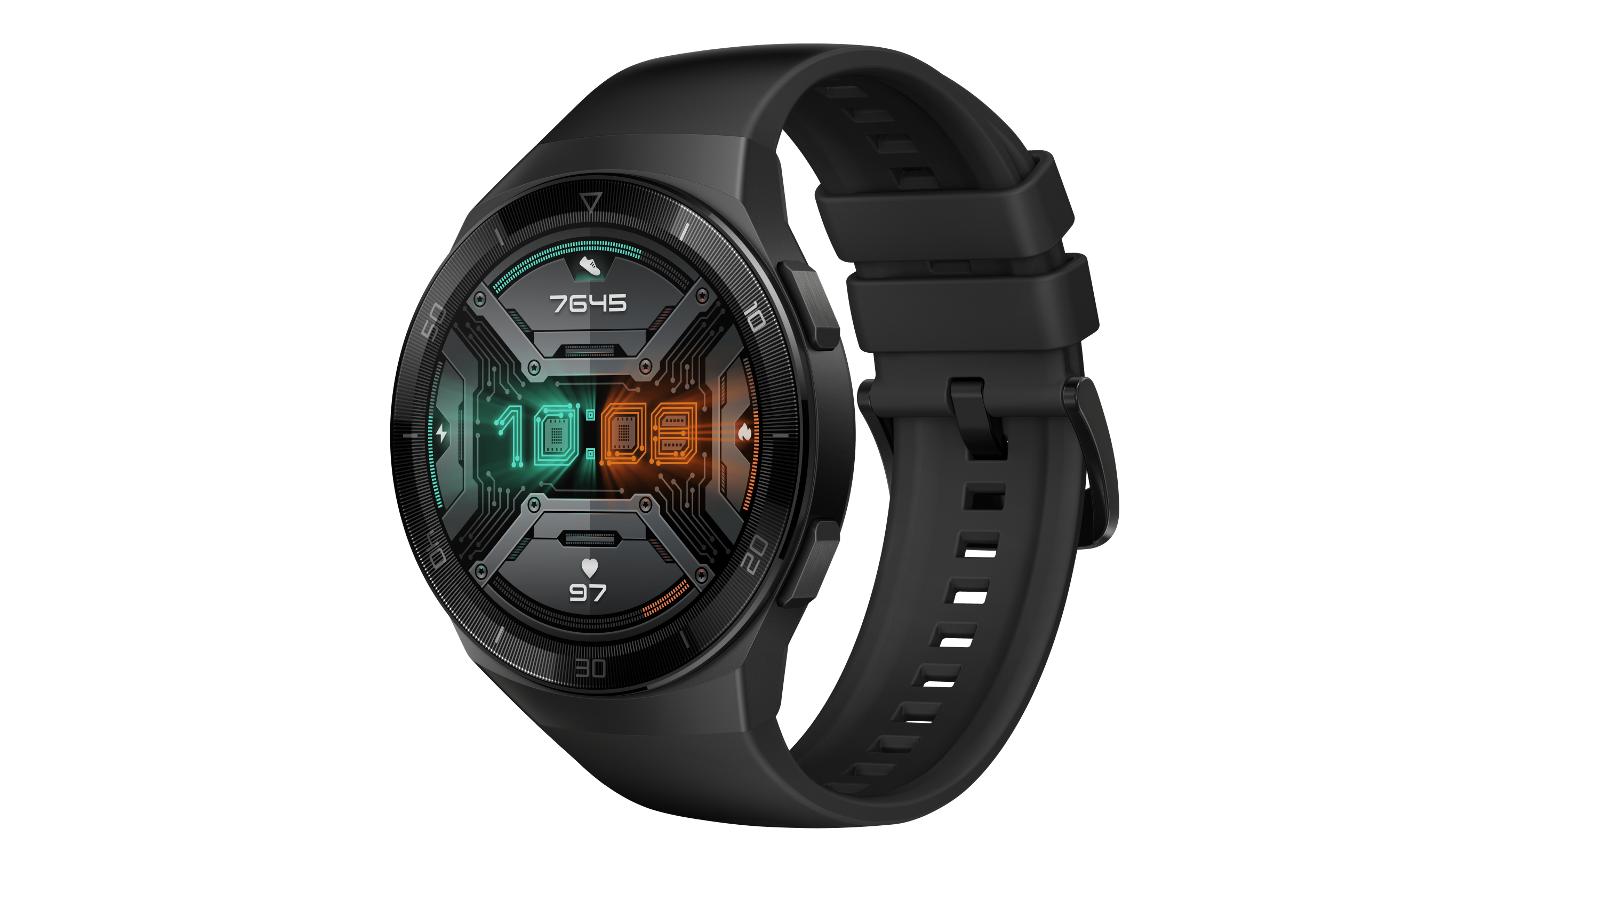 Huawei Watch GT 2e review: stylish convenience [Sponsored] - Gearburn - gearburn